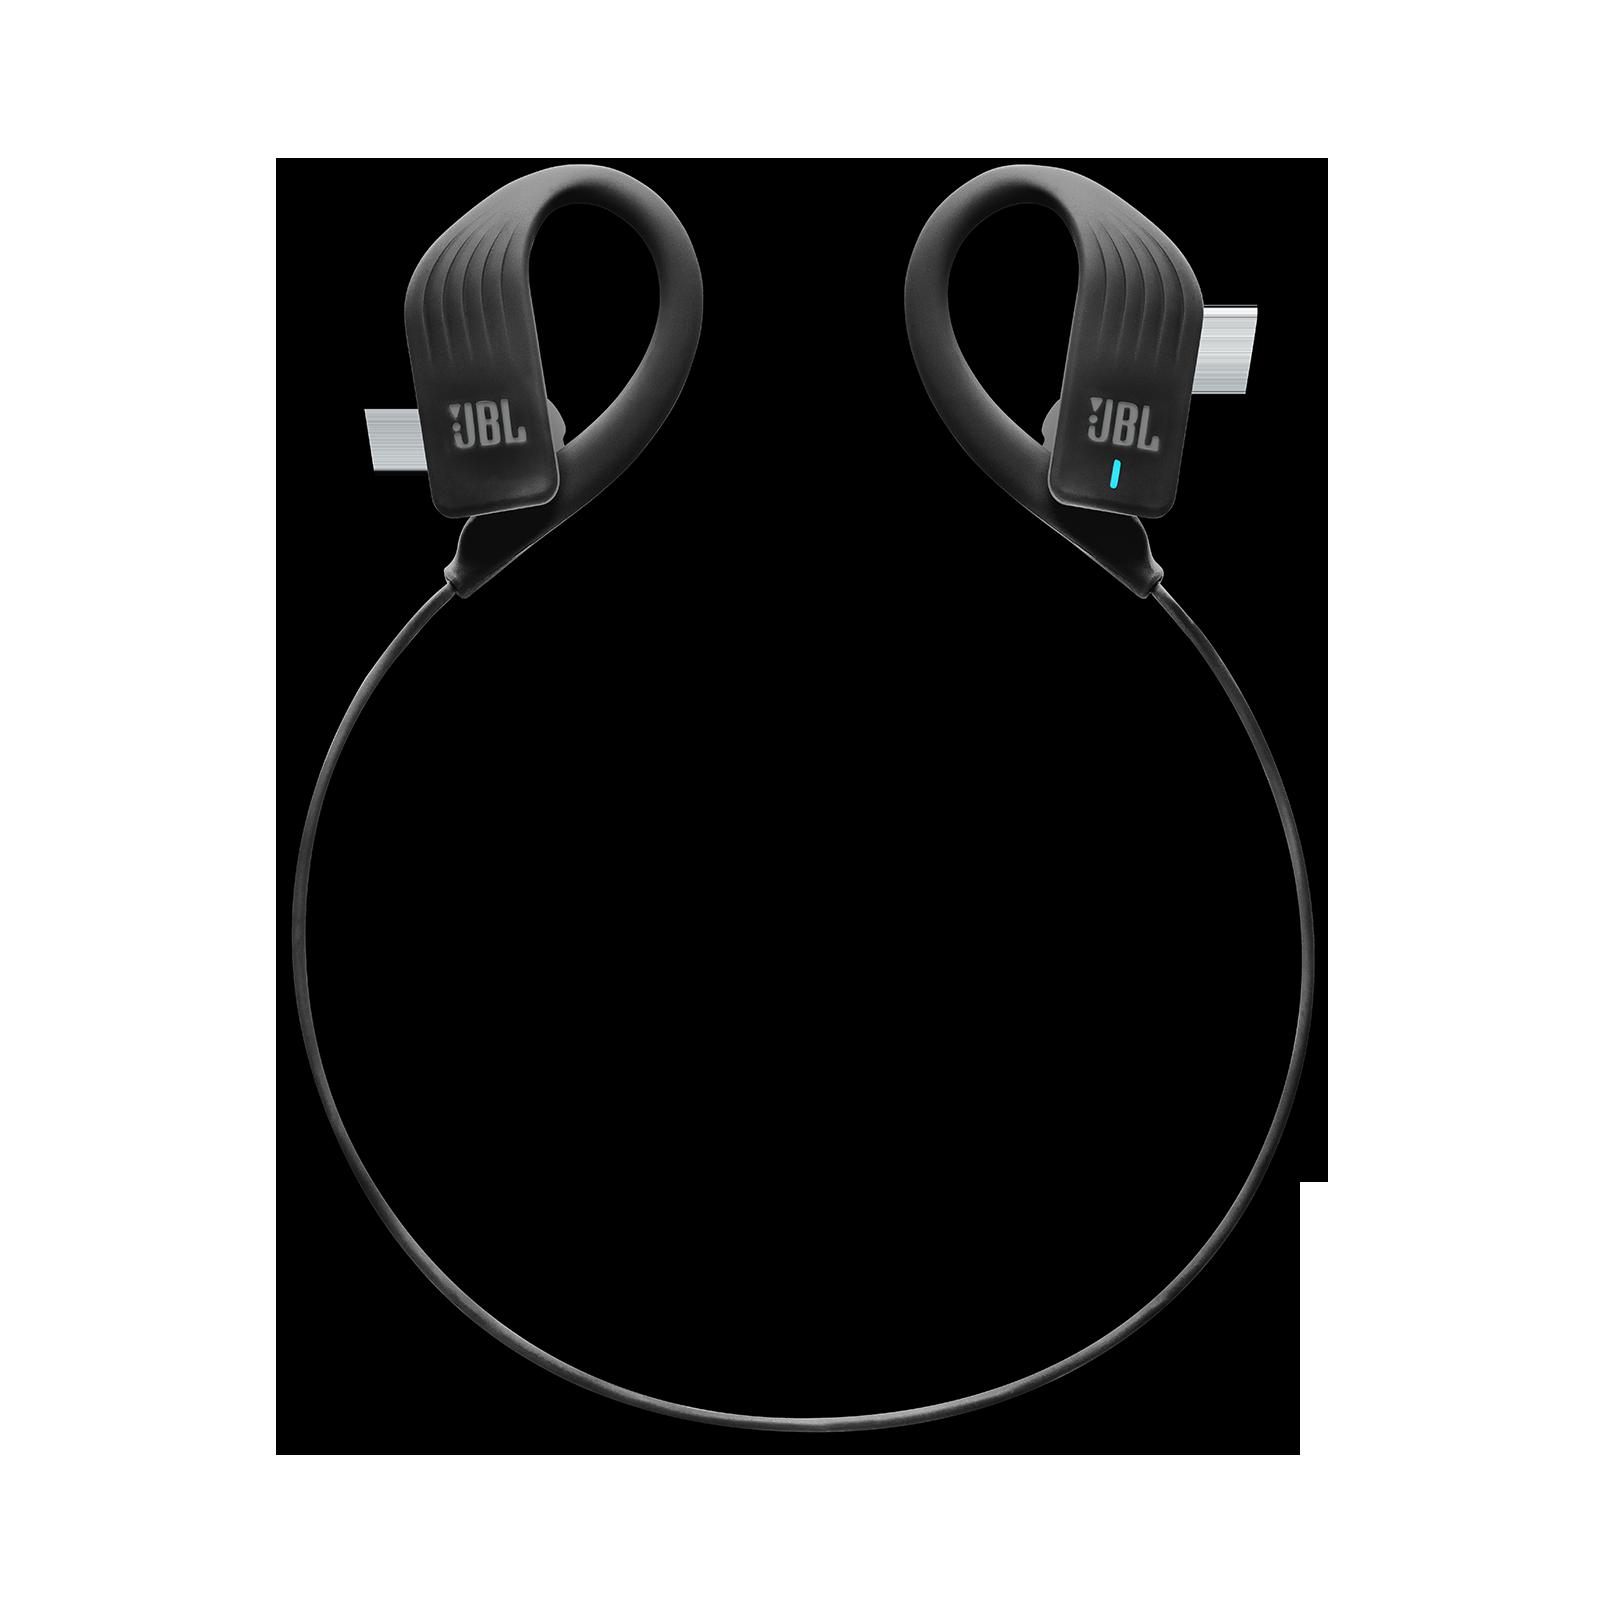 JBL Endurance SPRINT - Black - Waterproof Wireless In-Ear Sport Headphones - Detailshot 2